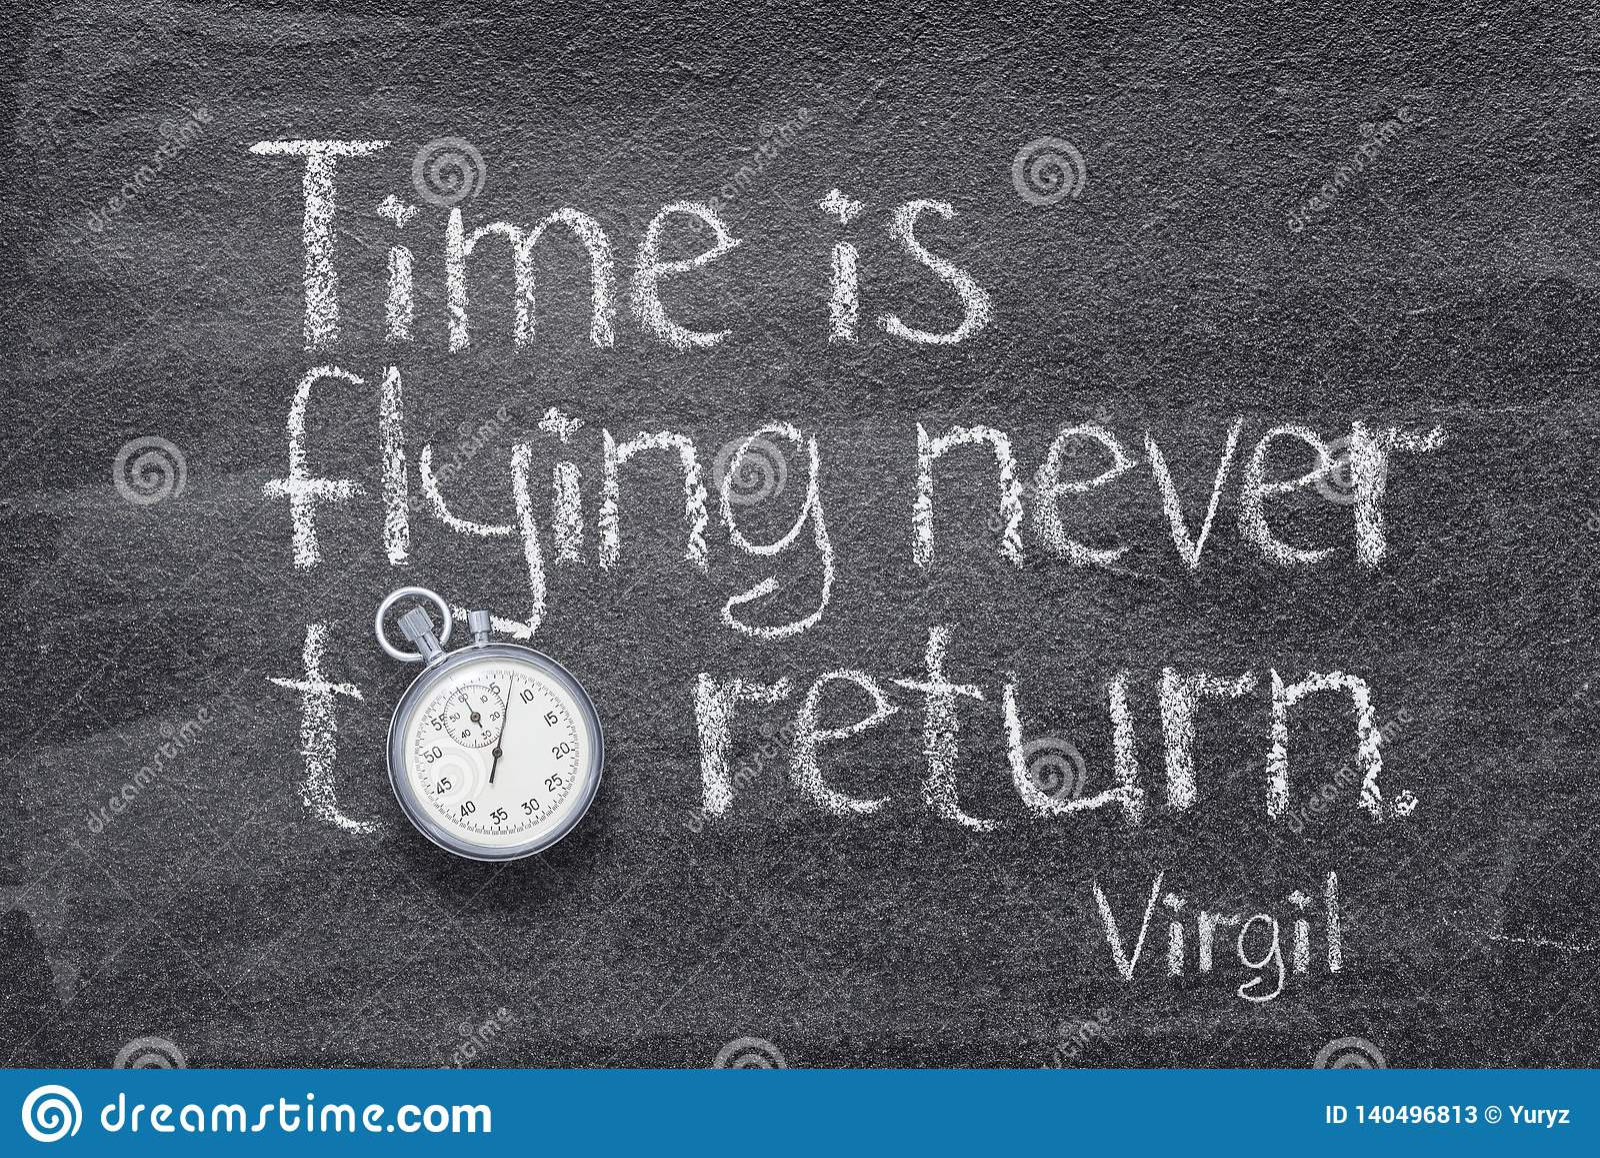 Time is flying Virgil